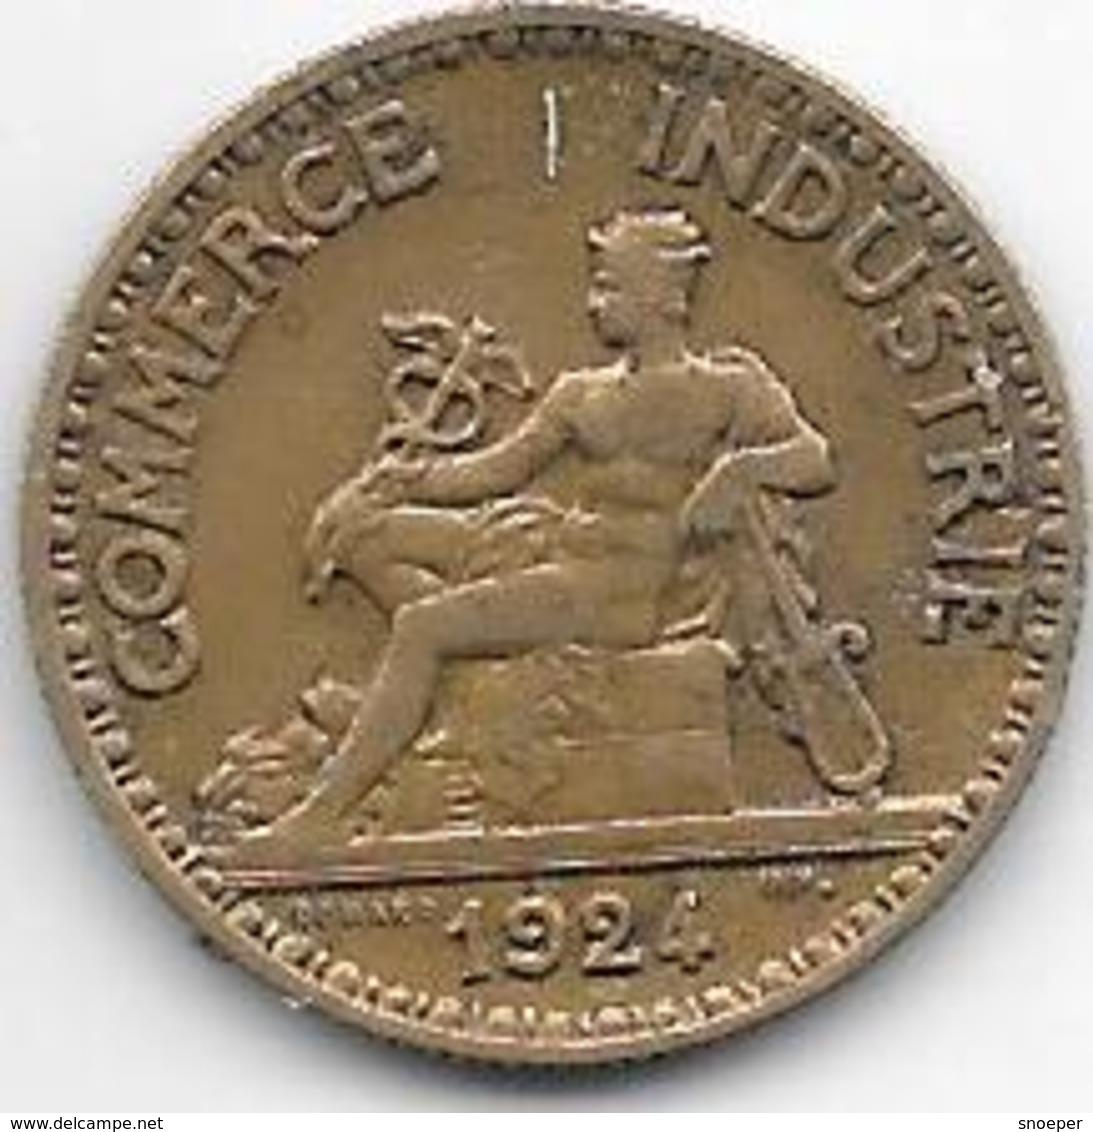 France 50 Centimes  1924  Km  884   Vf+ - France